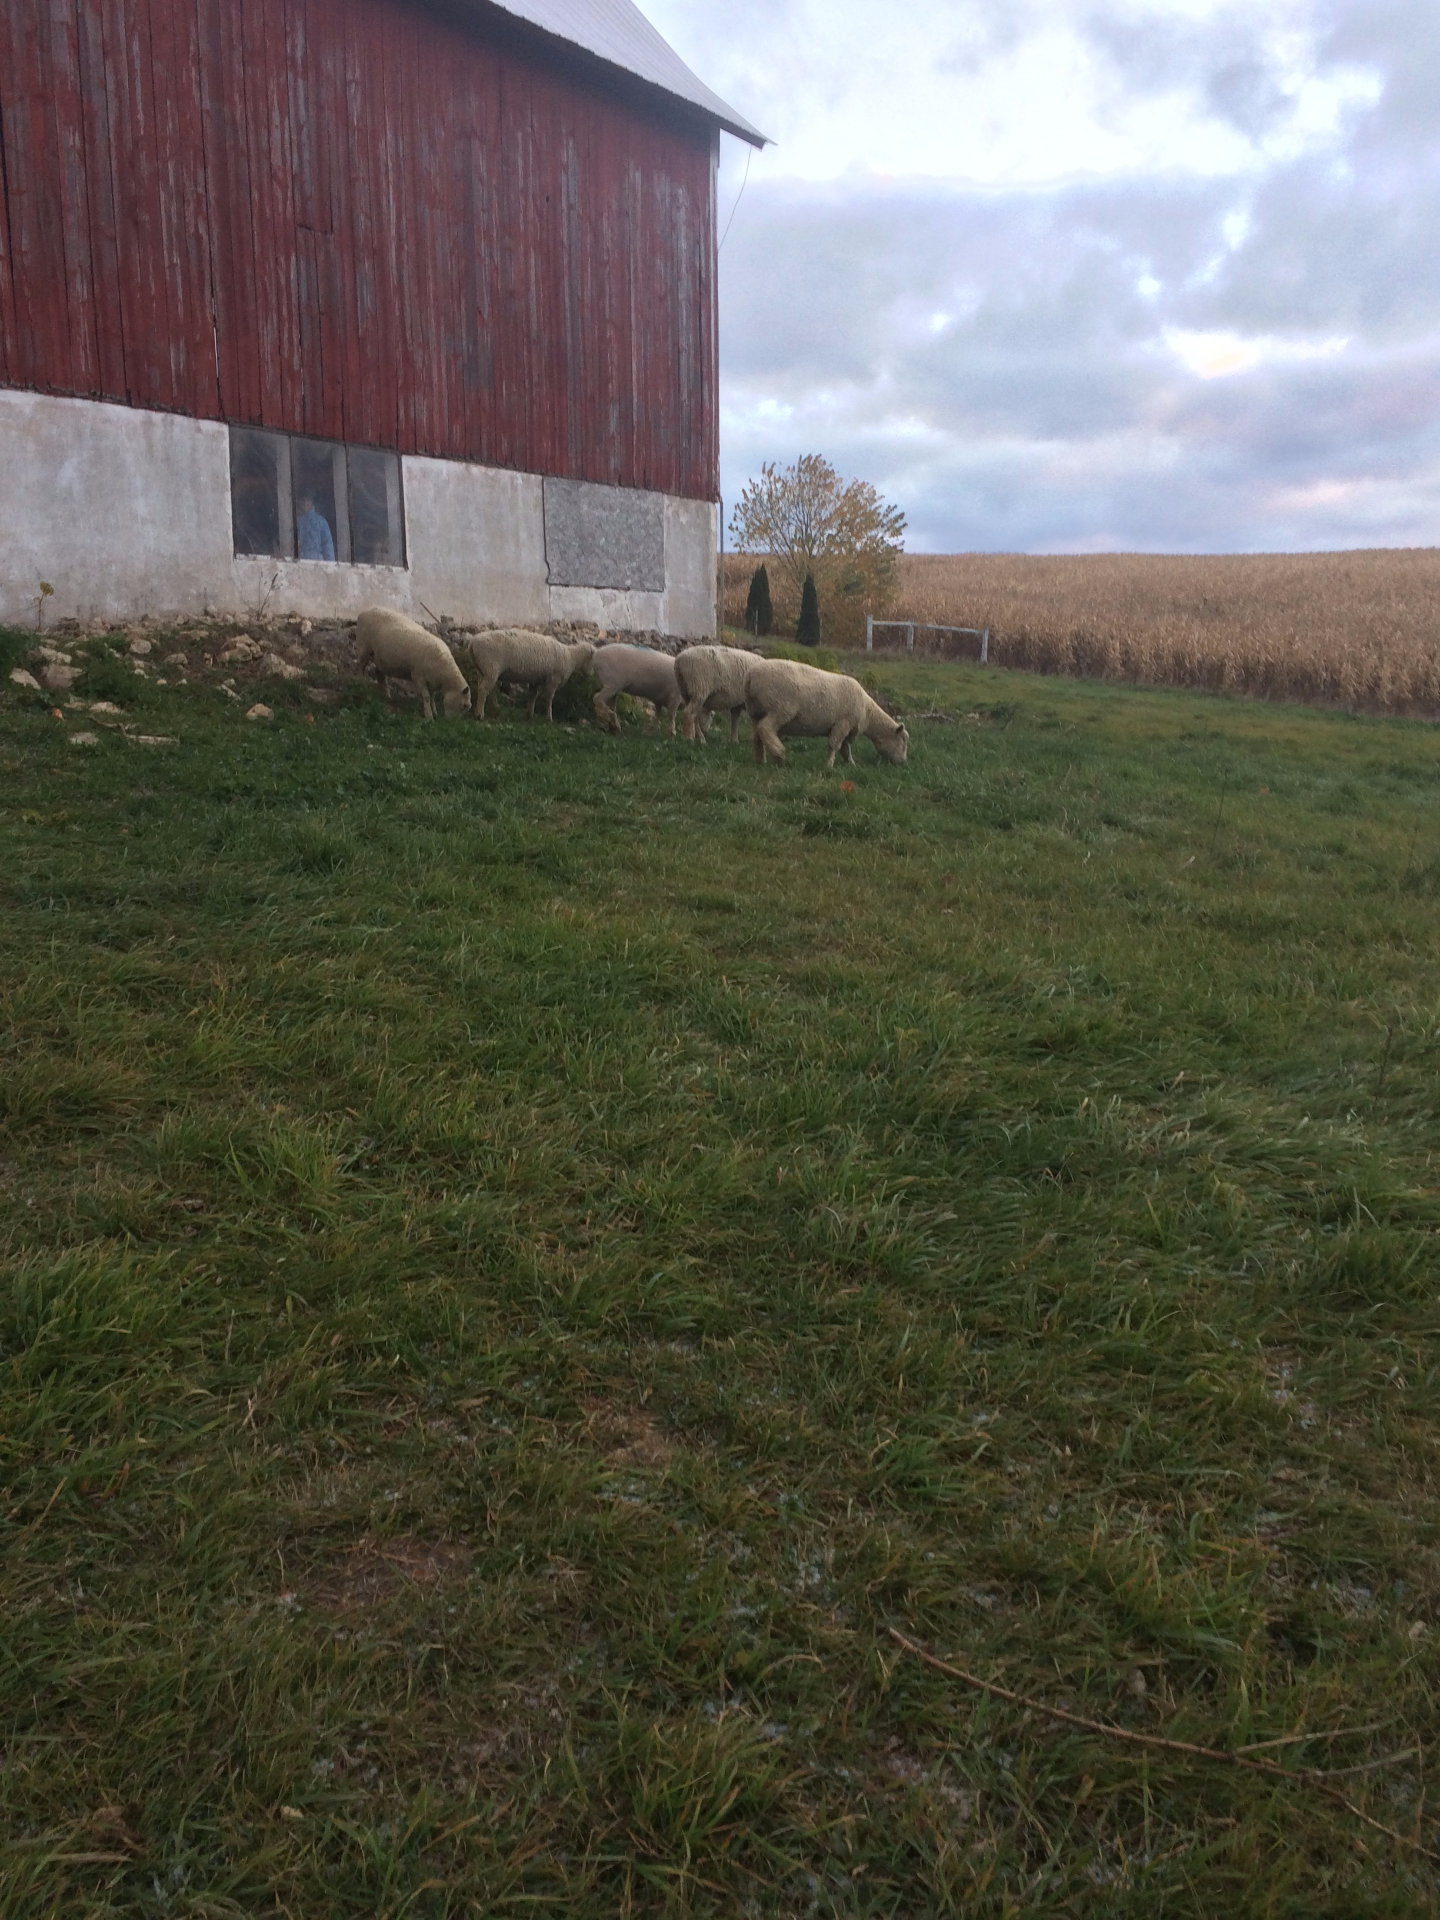 Ewes in yard